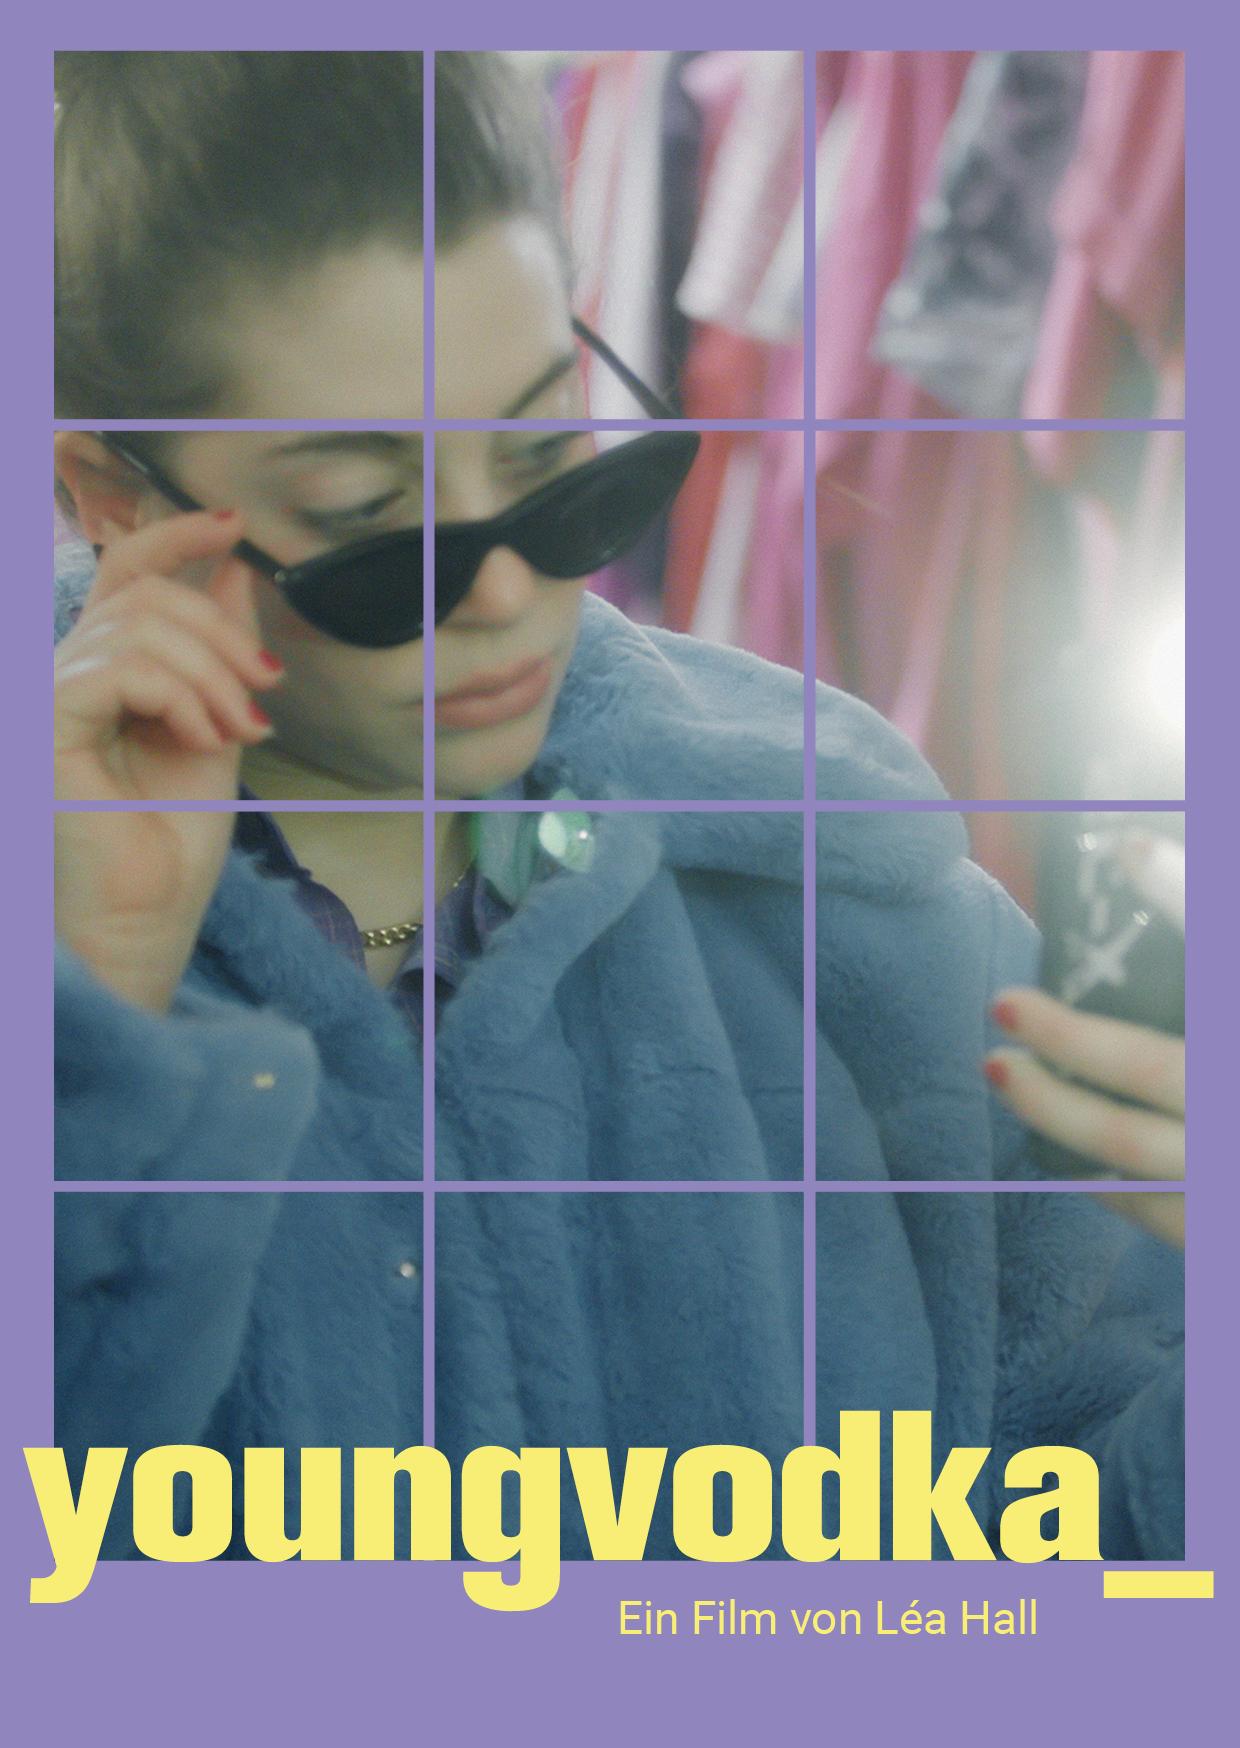 YOUNGVODKA__Postkarte1A.jpg